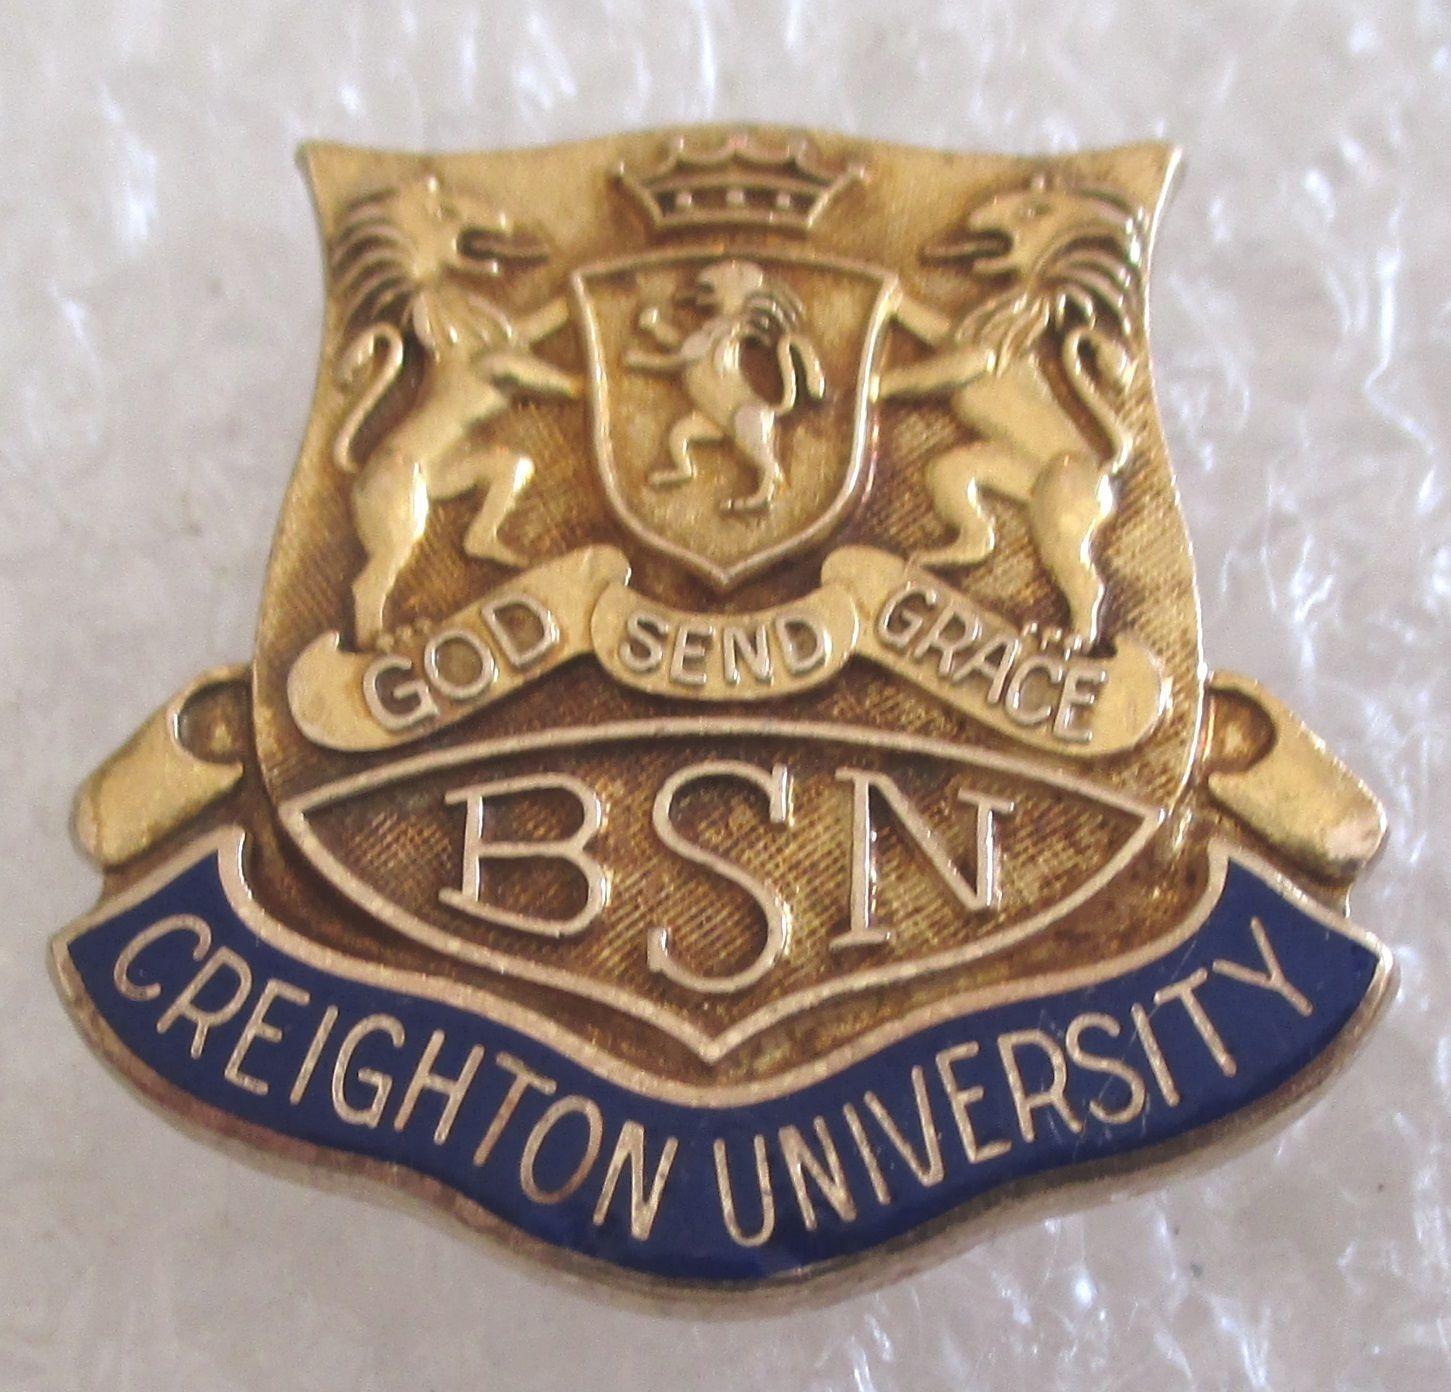 Creighton university bsn omaha ne nursing pins